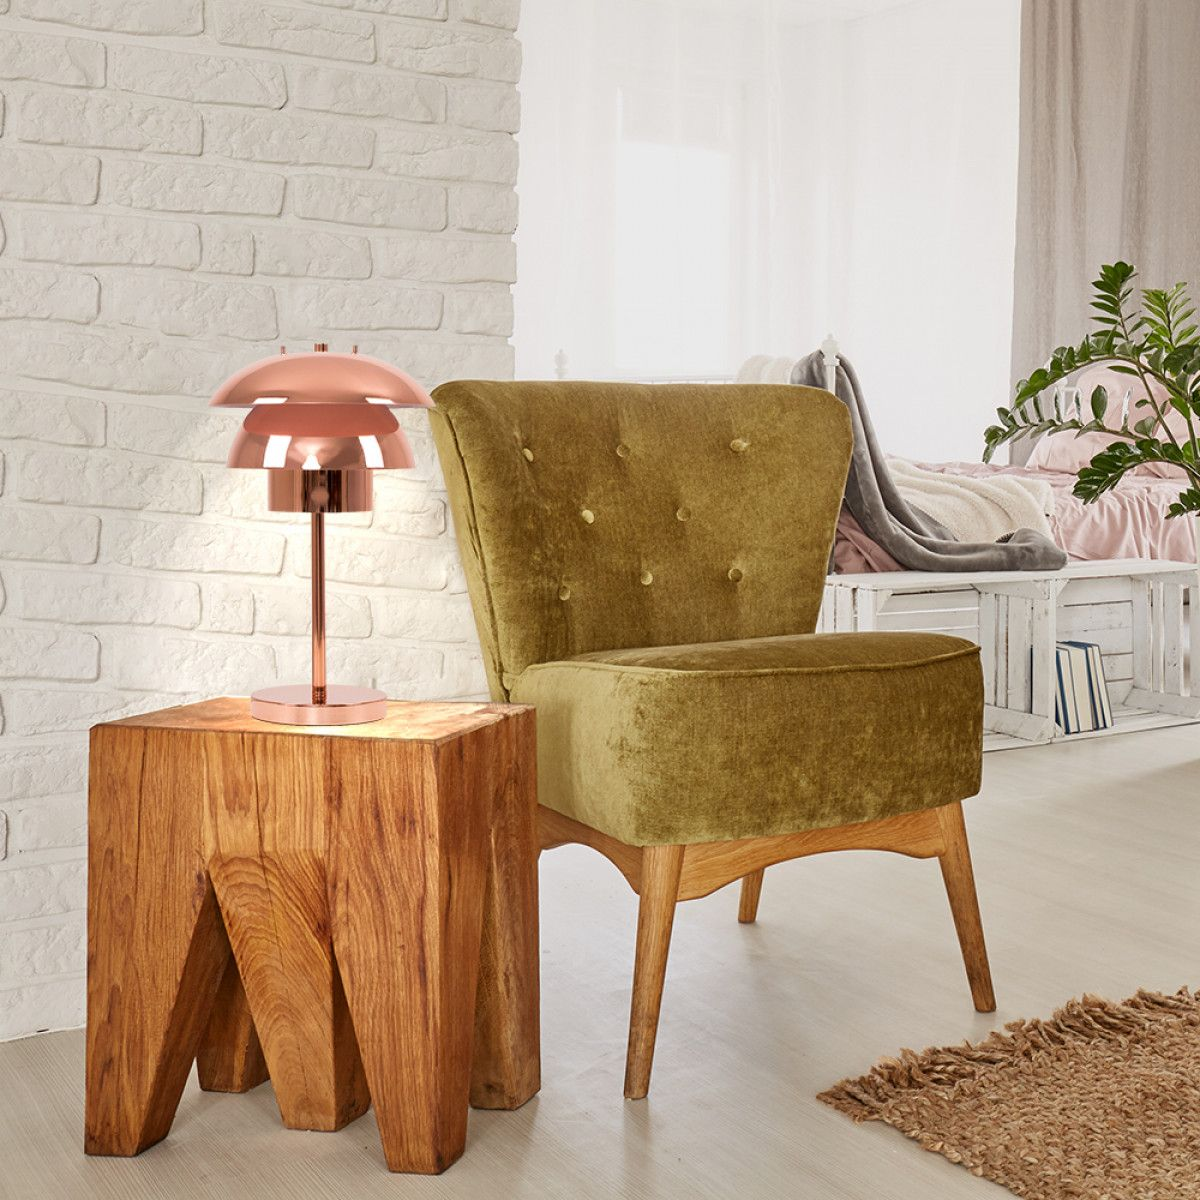 Atomic Eames Modern Art Ceramic Brass Table Lamp W 3 Tier Fiberglass Shade Lamp Vintage Lamps Table Lamp